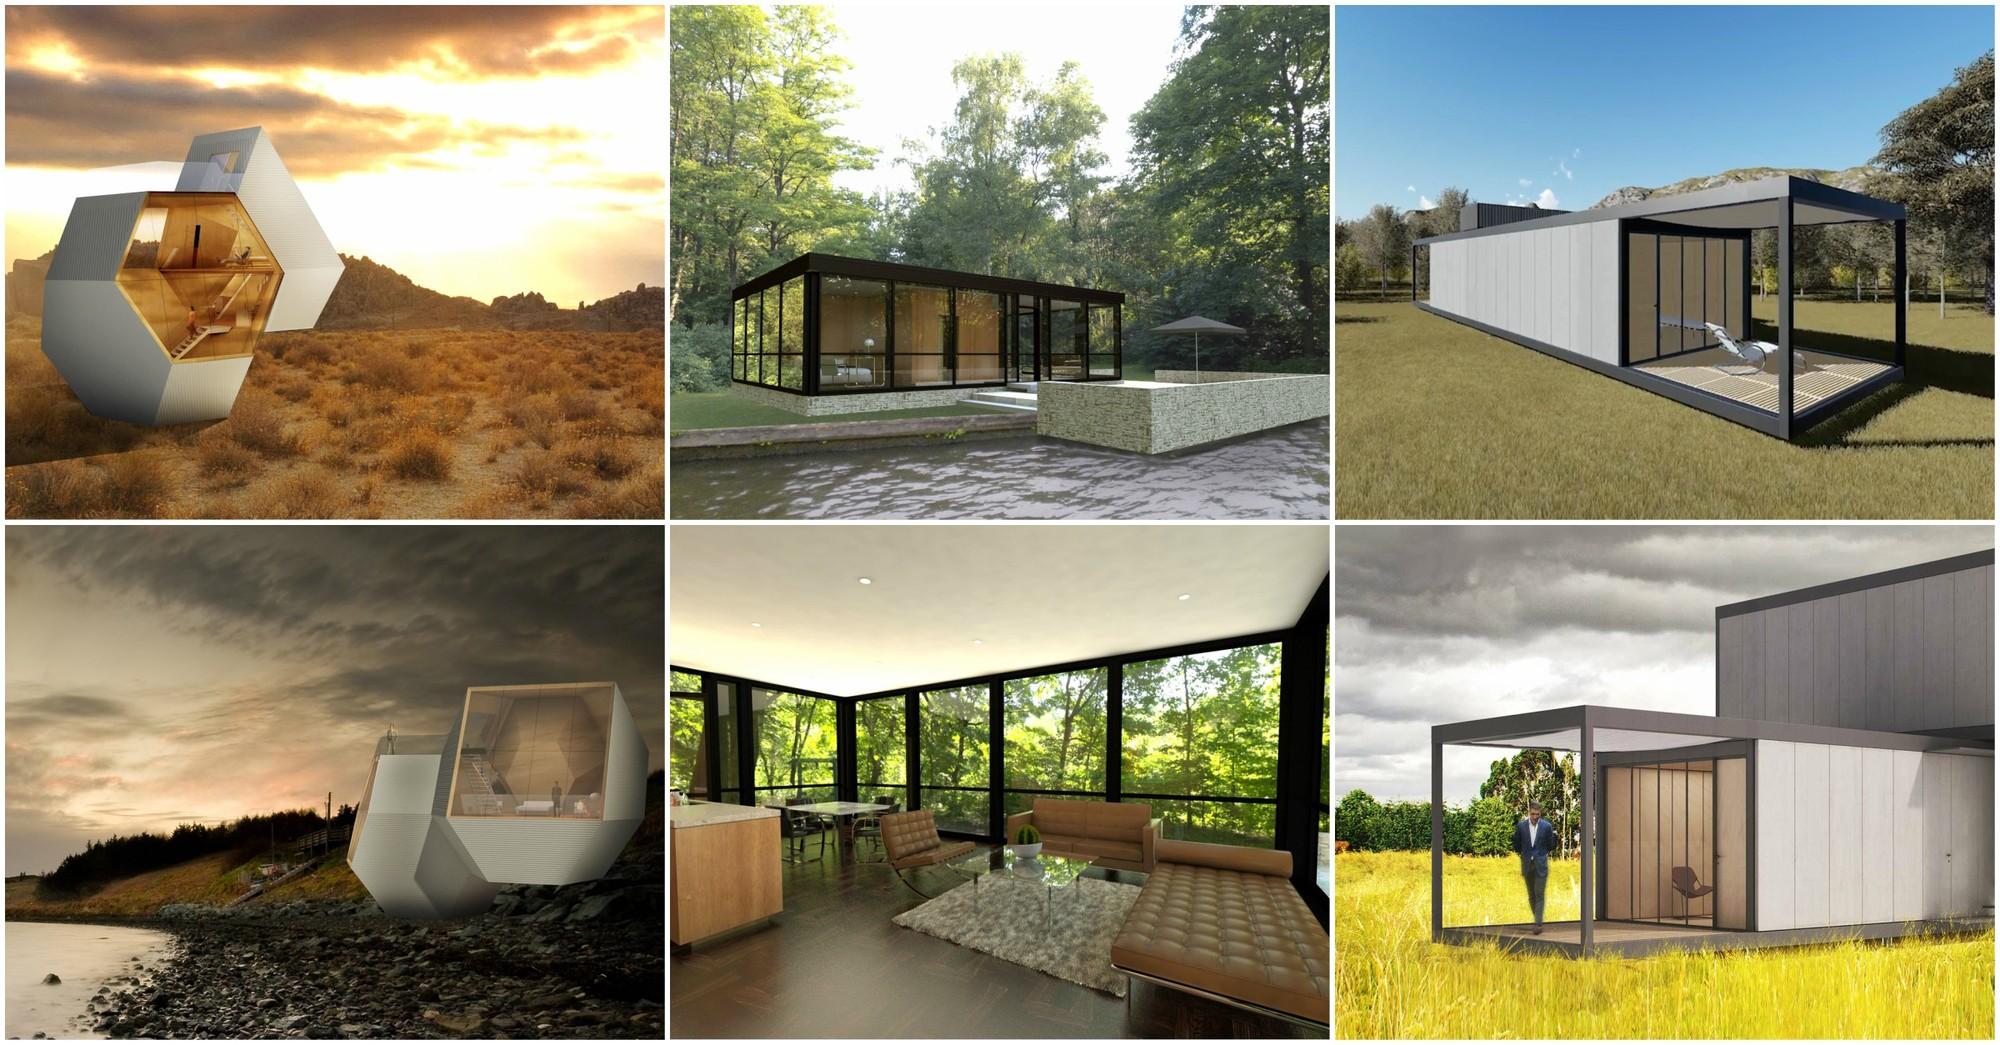 100 concrete homes designs concrete and glass